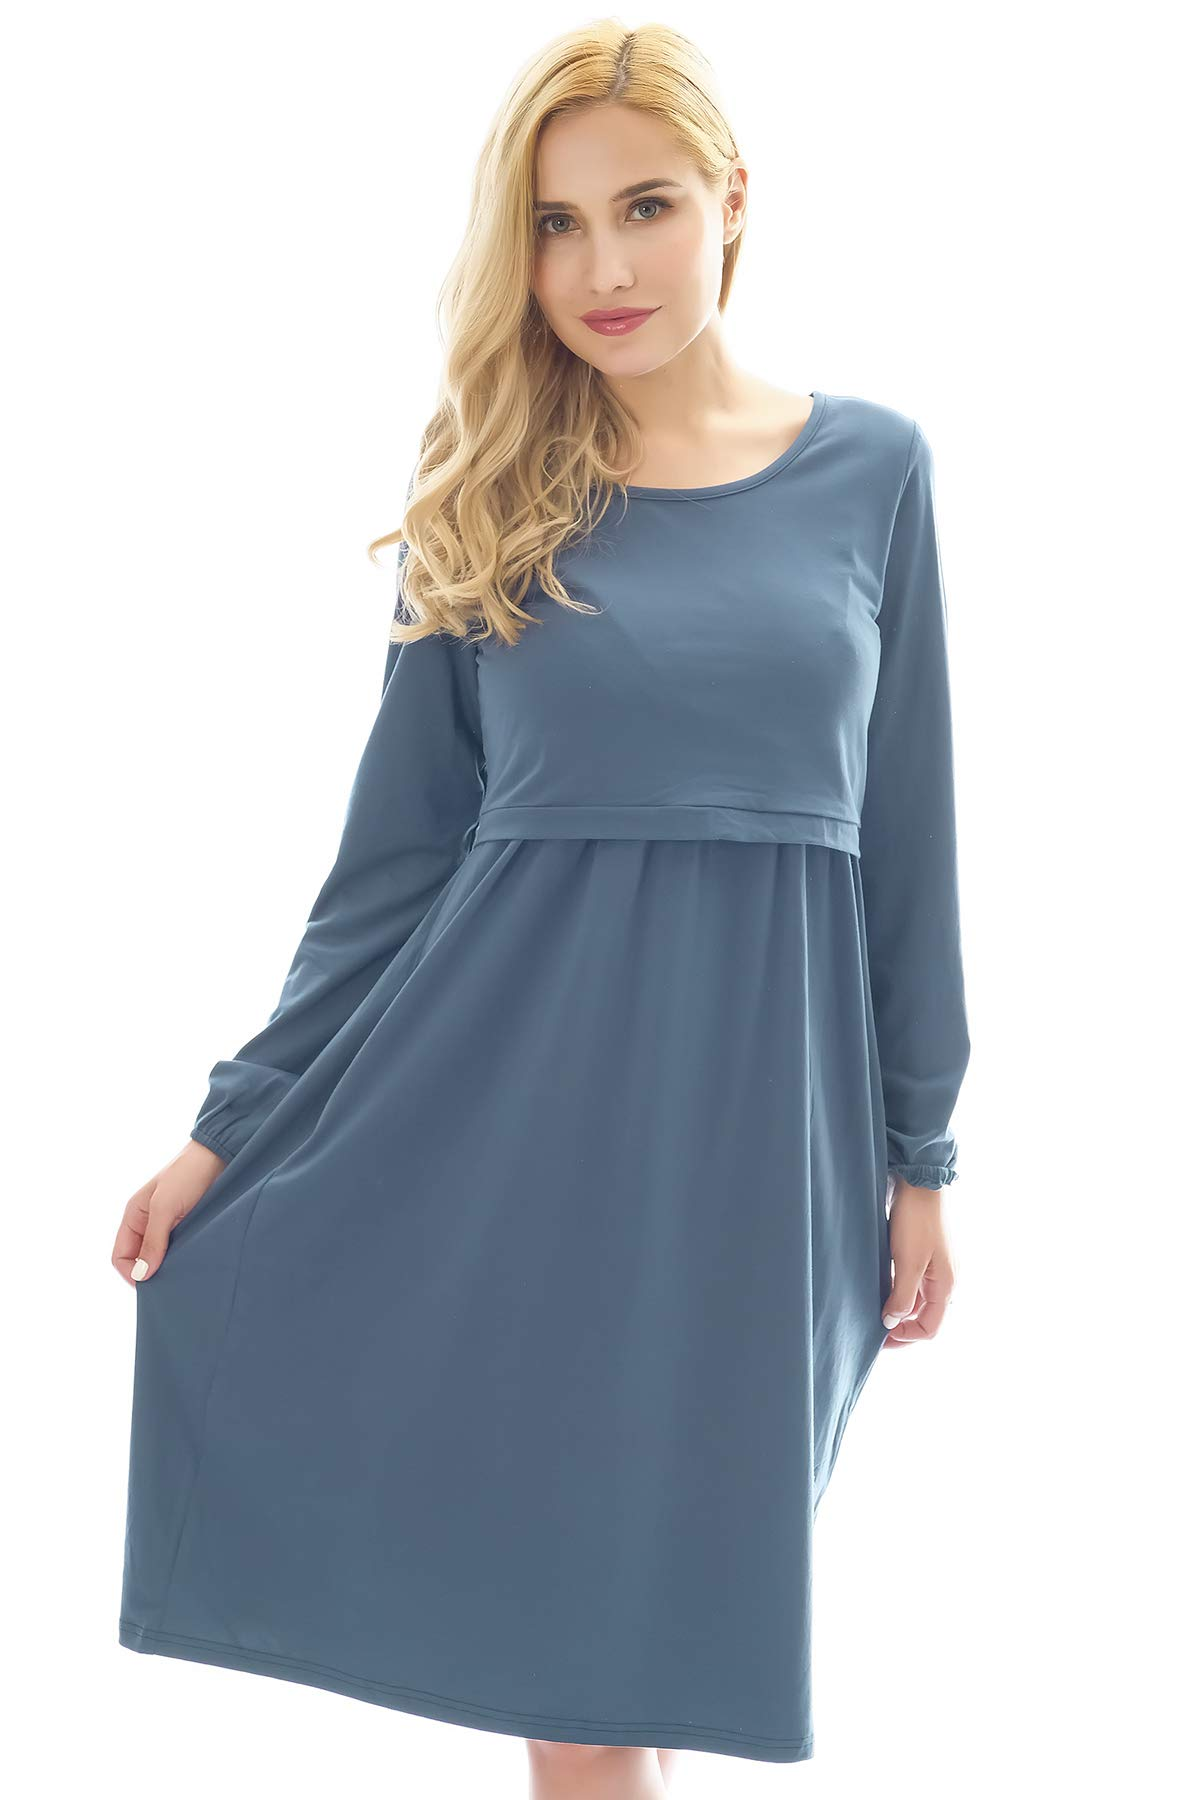 Bearsland Womens Maternity Long Sleeve Soft Nursing Breastfeeding Dresses Pockets